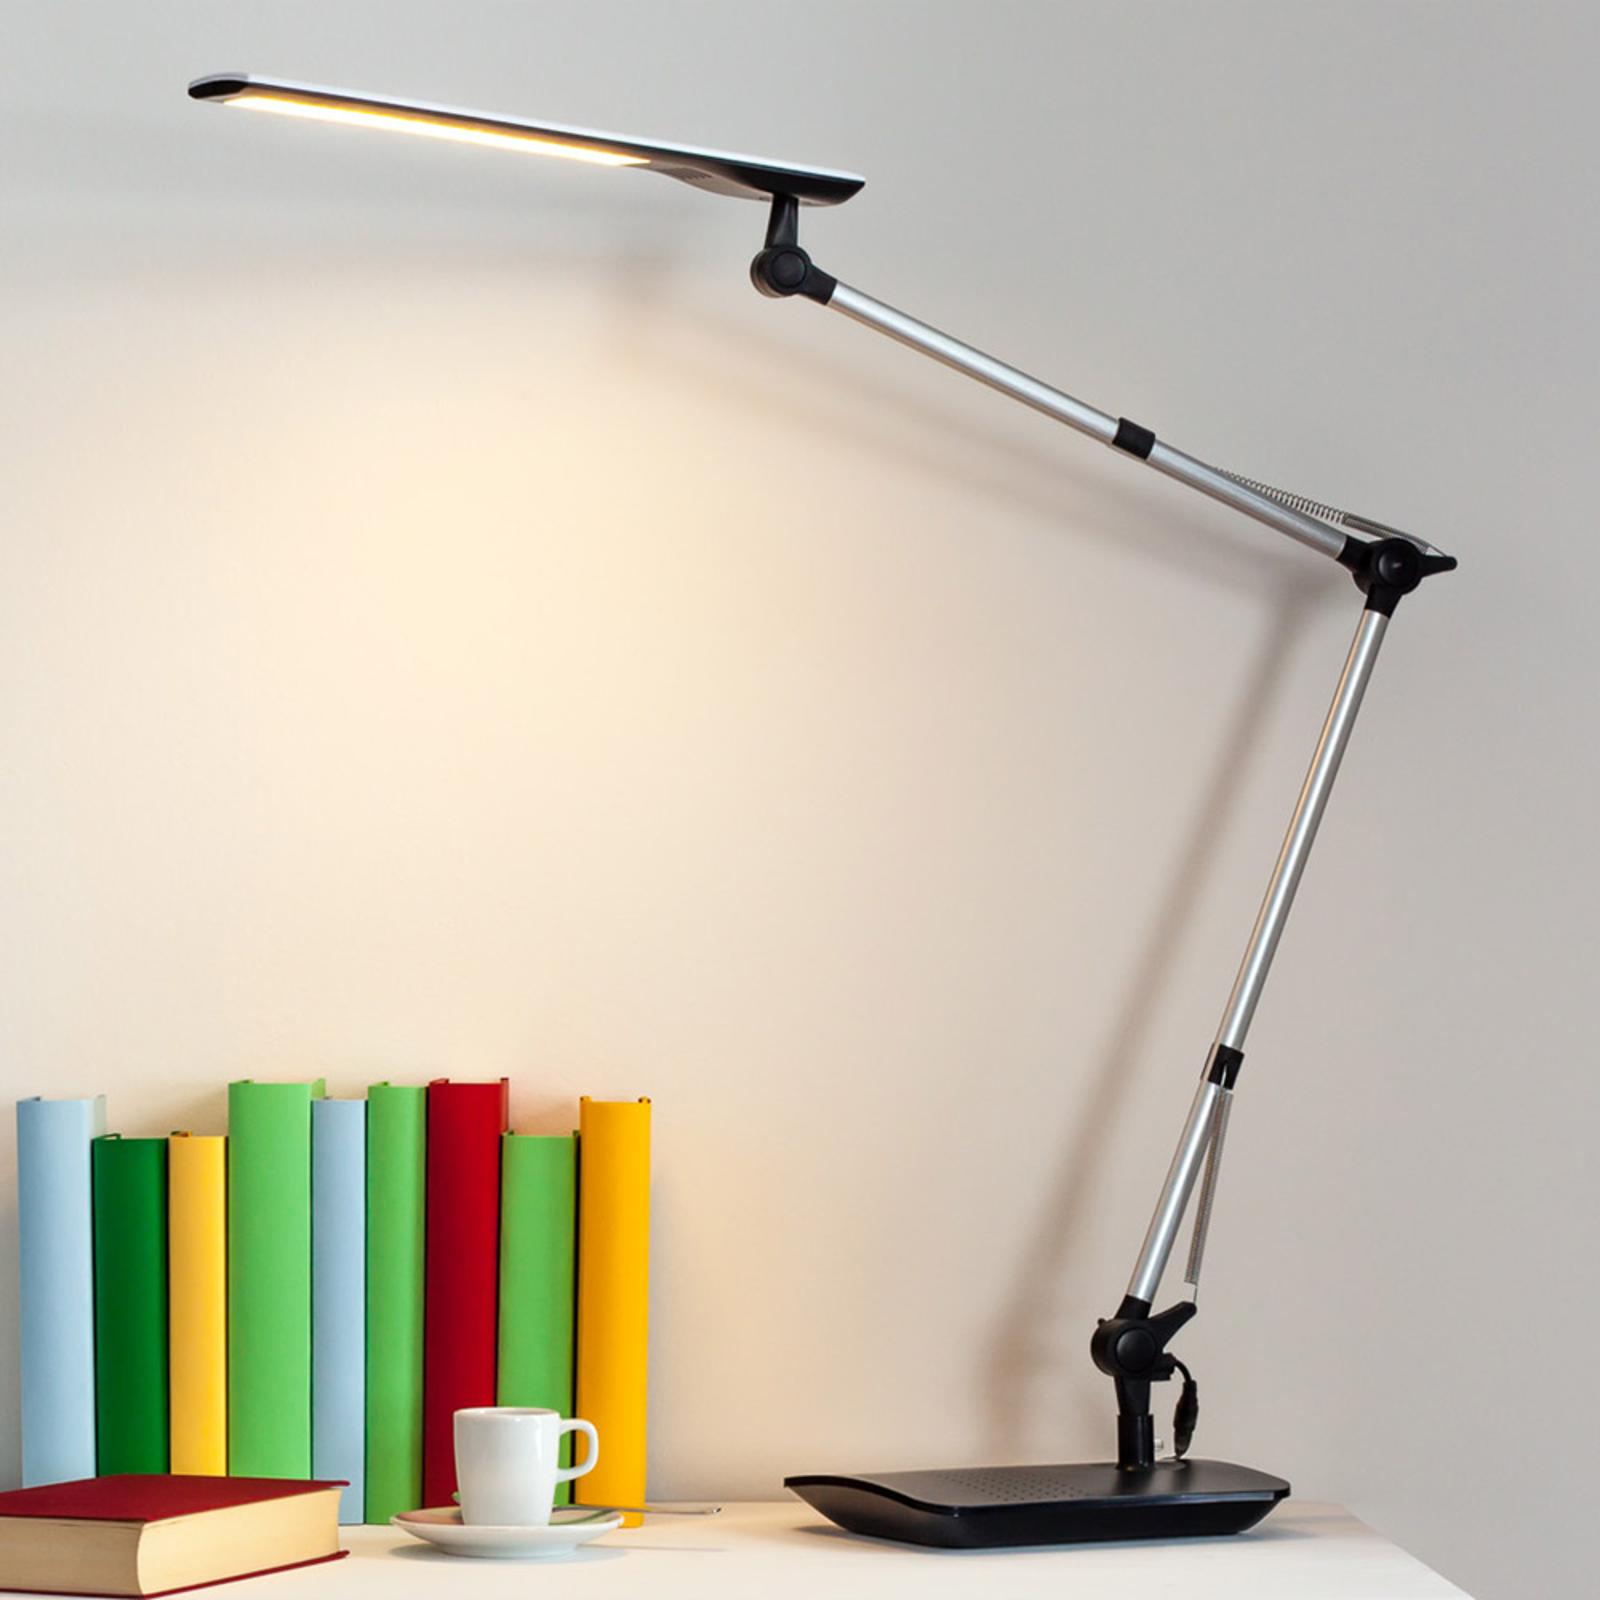 Felipe LED Desk Lamp with Clip-on Base_9643013_1